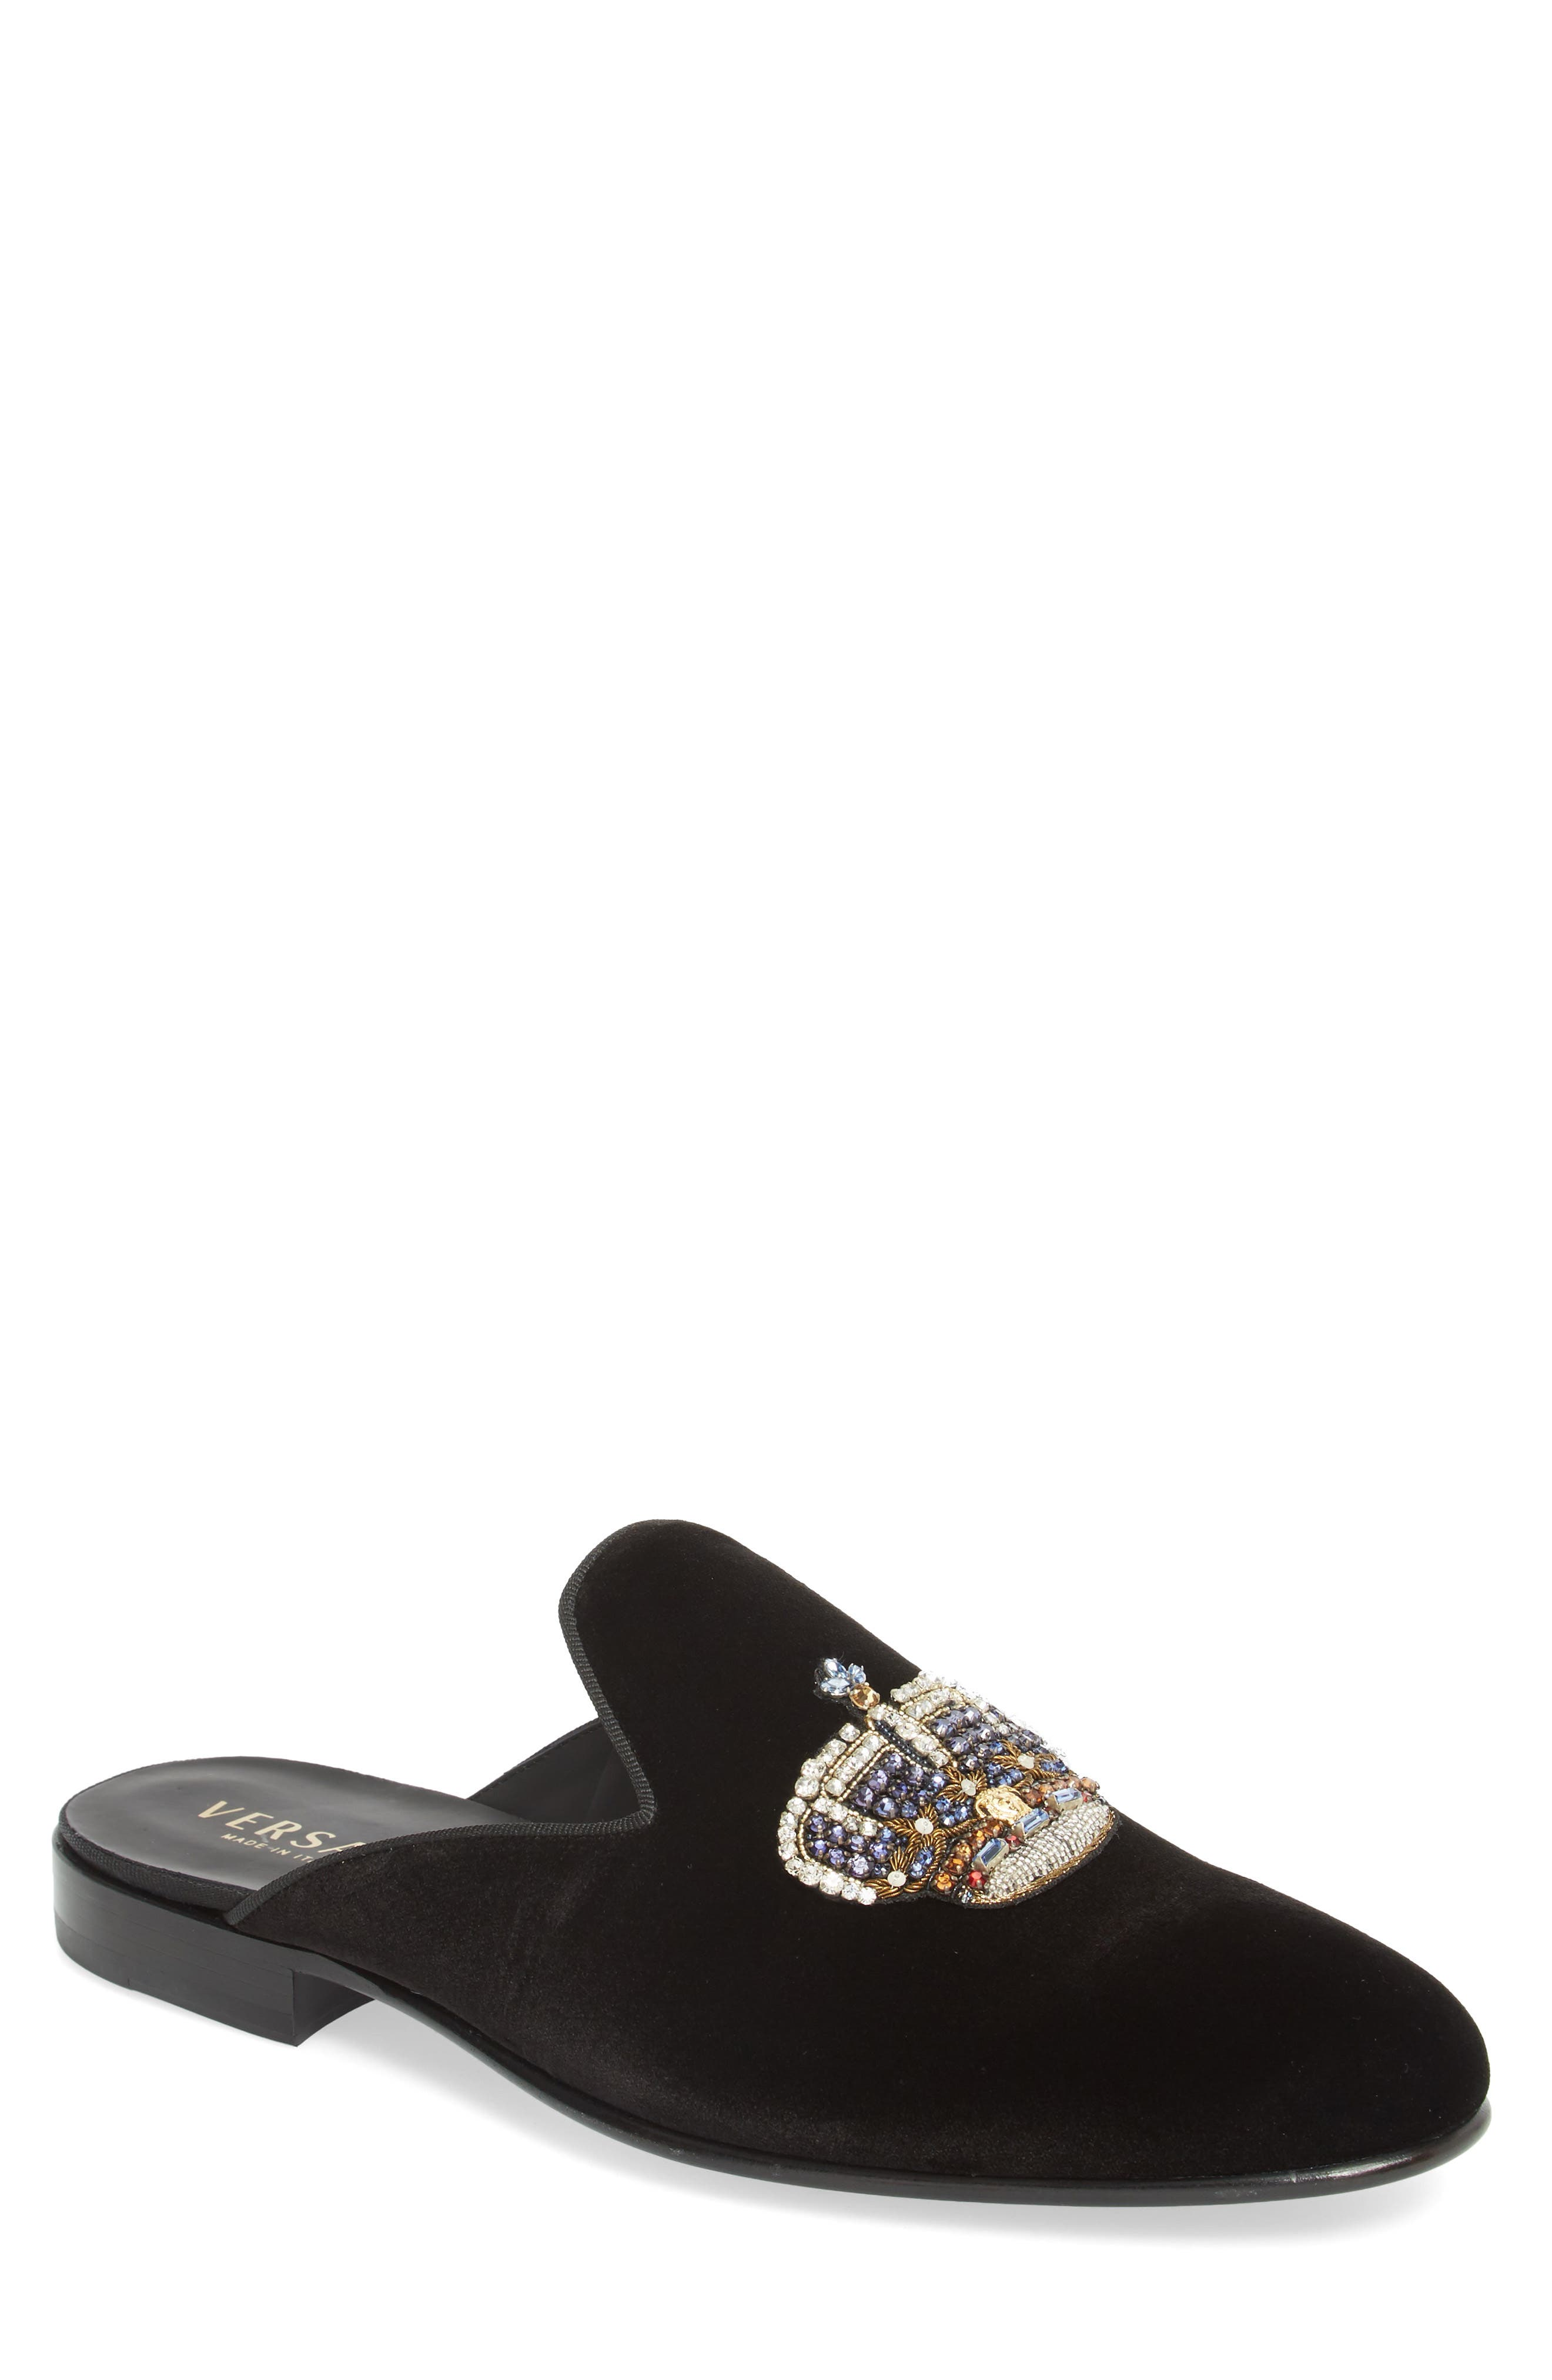 Gianni Embellished Crown Loafer Mule,                             Main thumbnail 1, color,                             Black Warm Gold